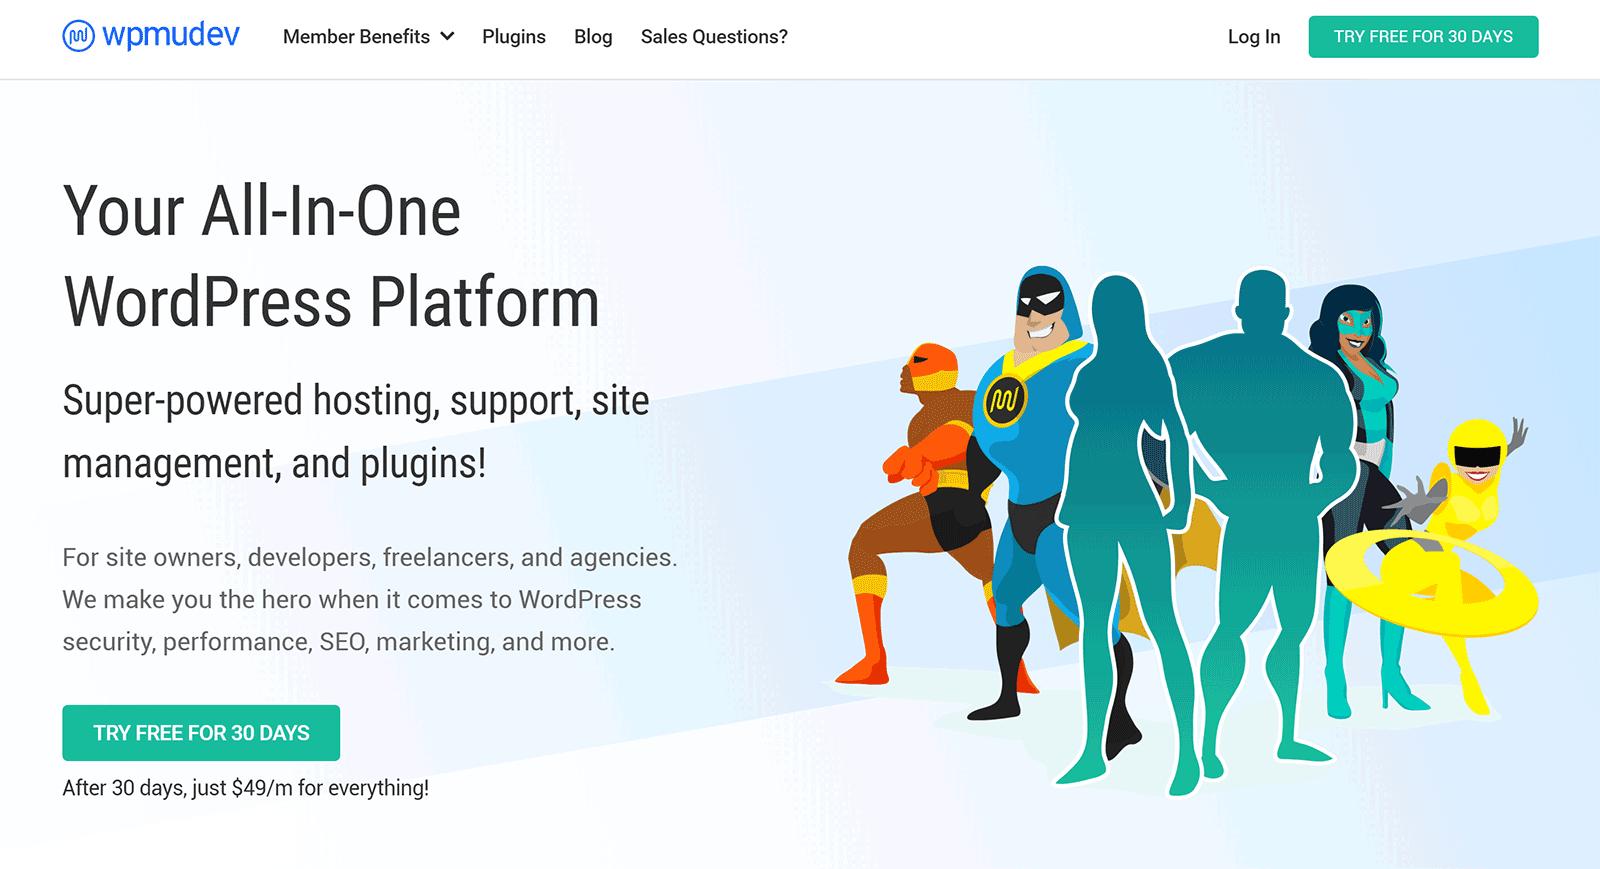 WPMU Dev - The All-in-One WordPress Platform